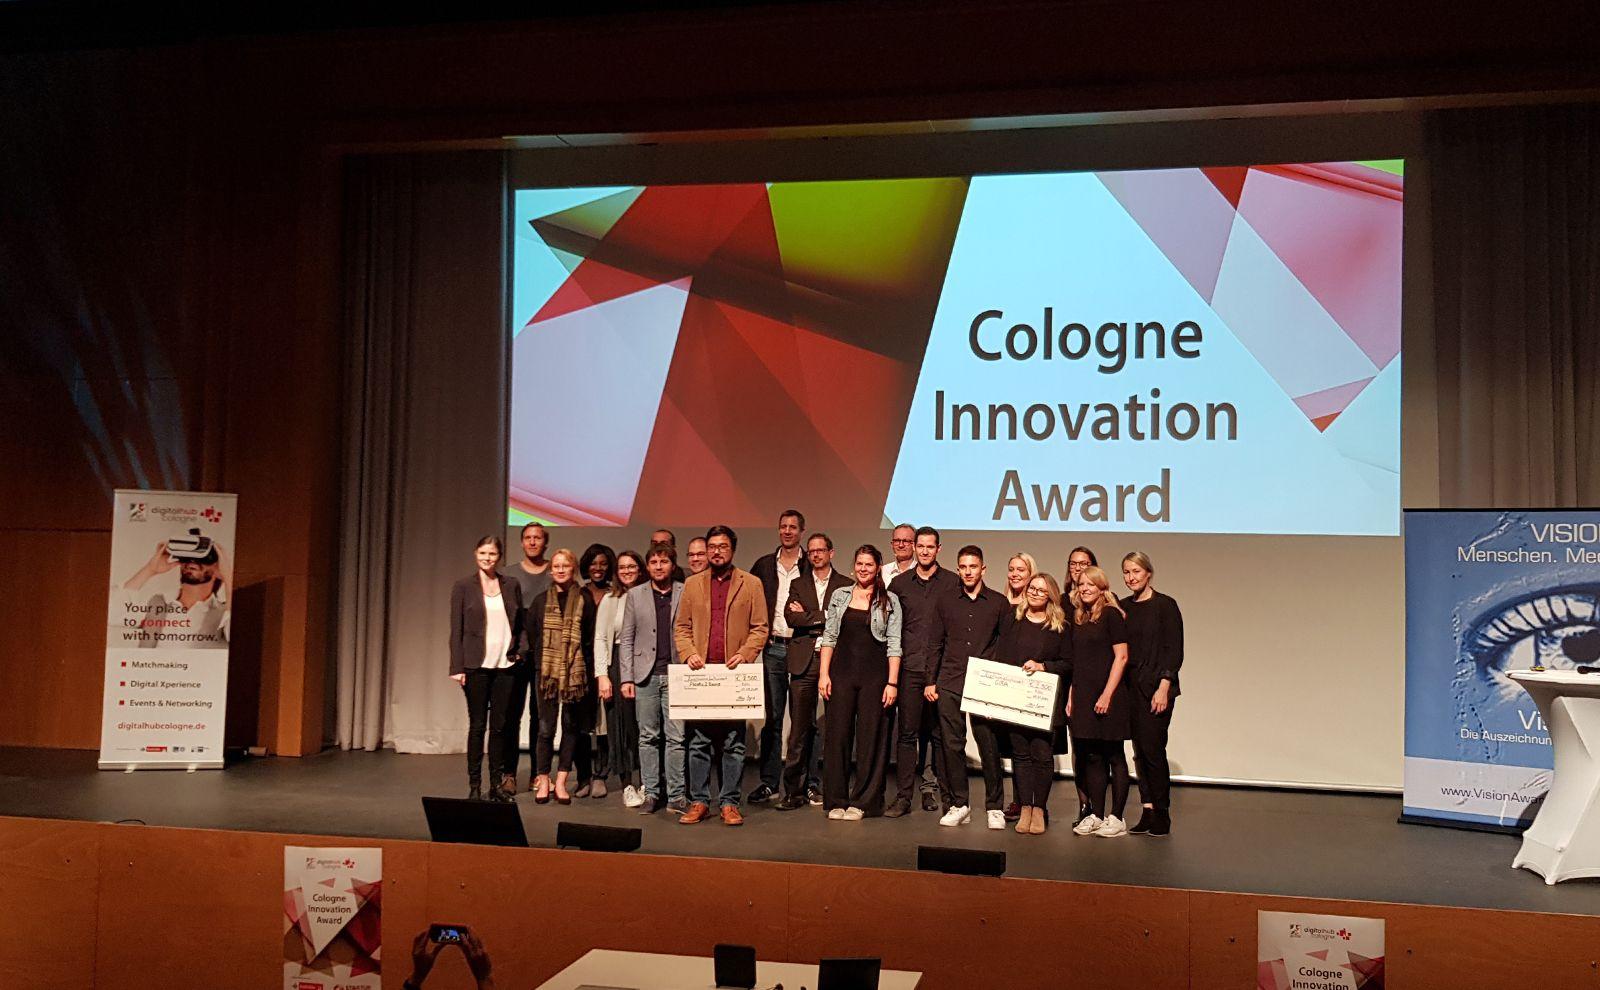 Cologne Innovation Award Preisträger auf der Bühne